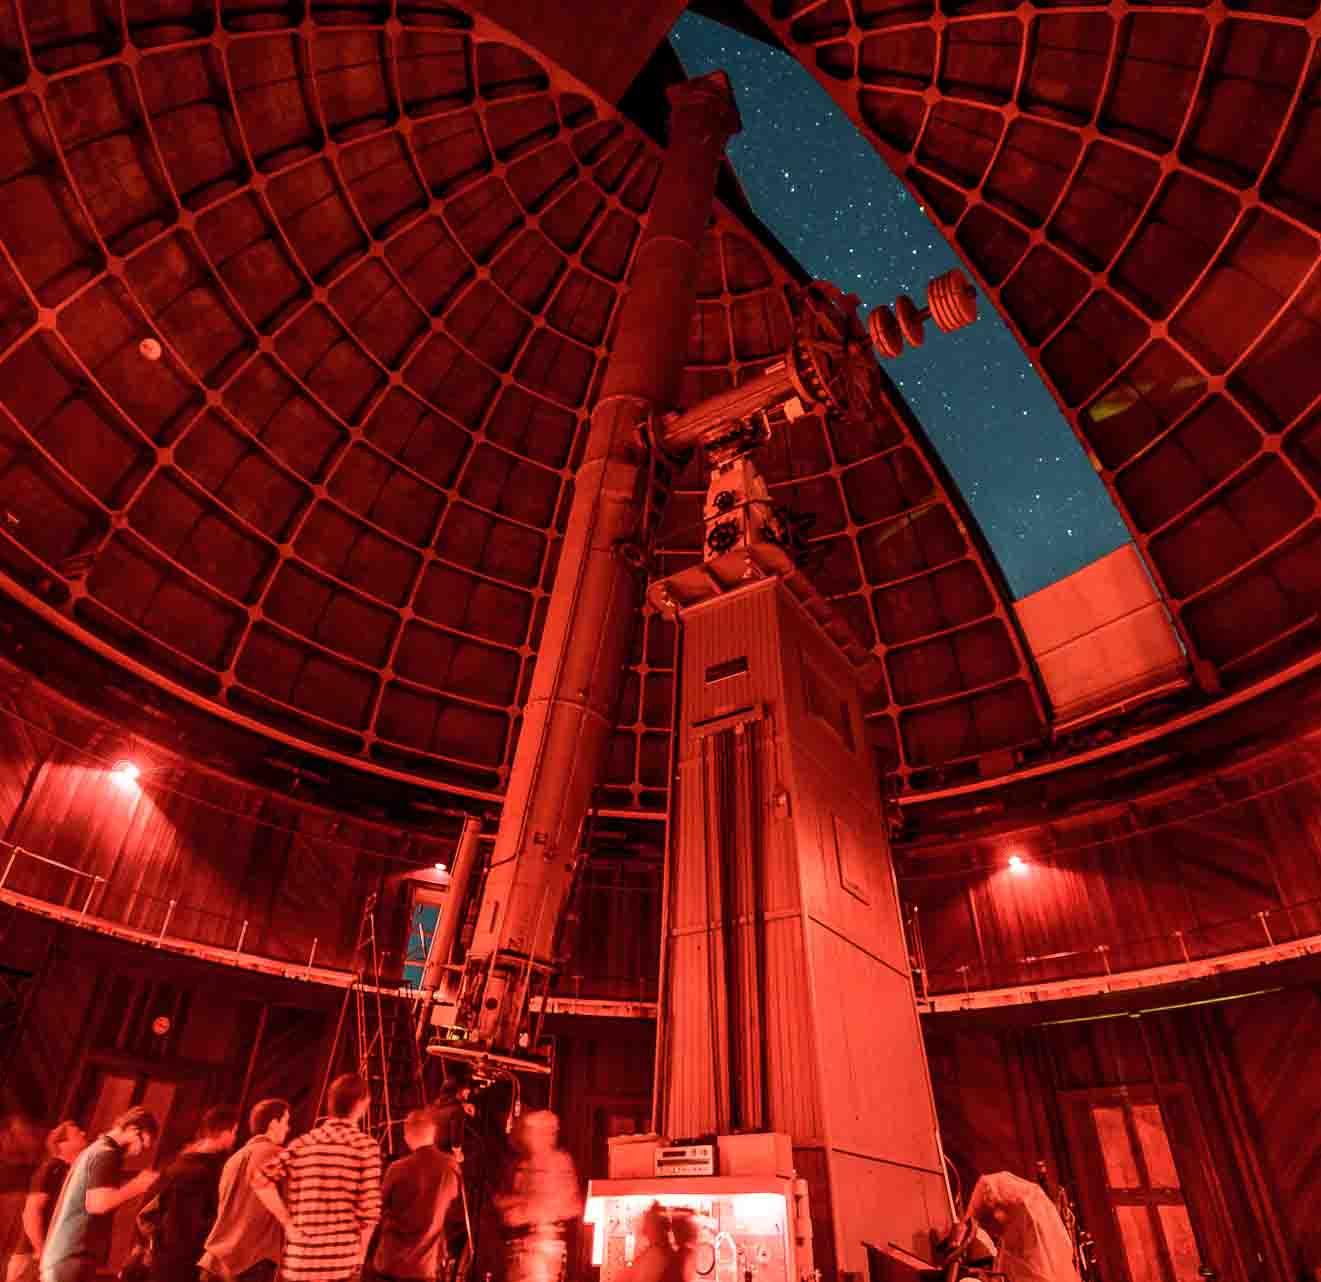 lick observatory music